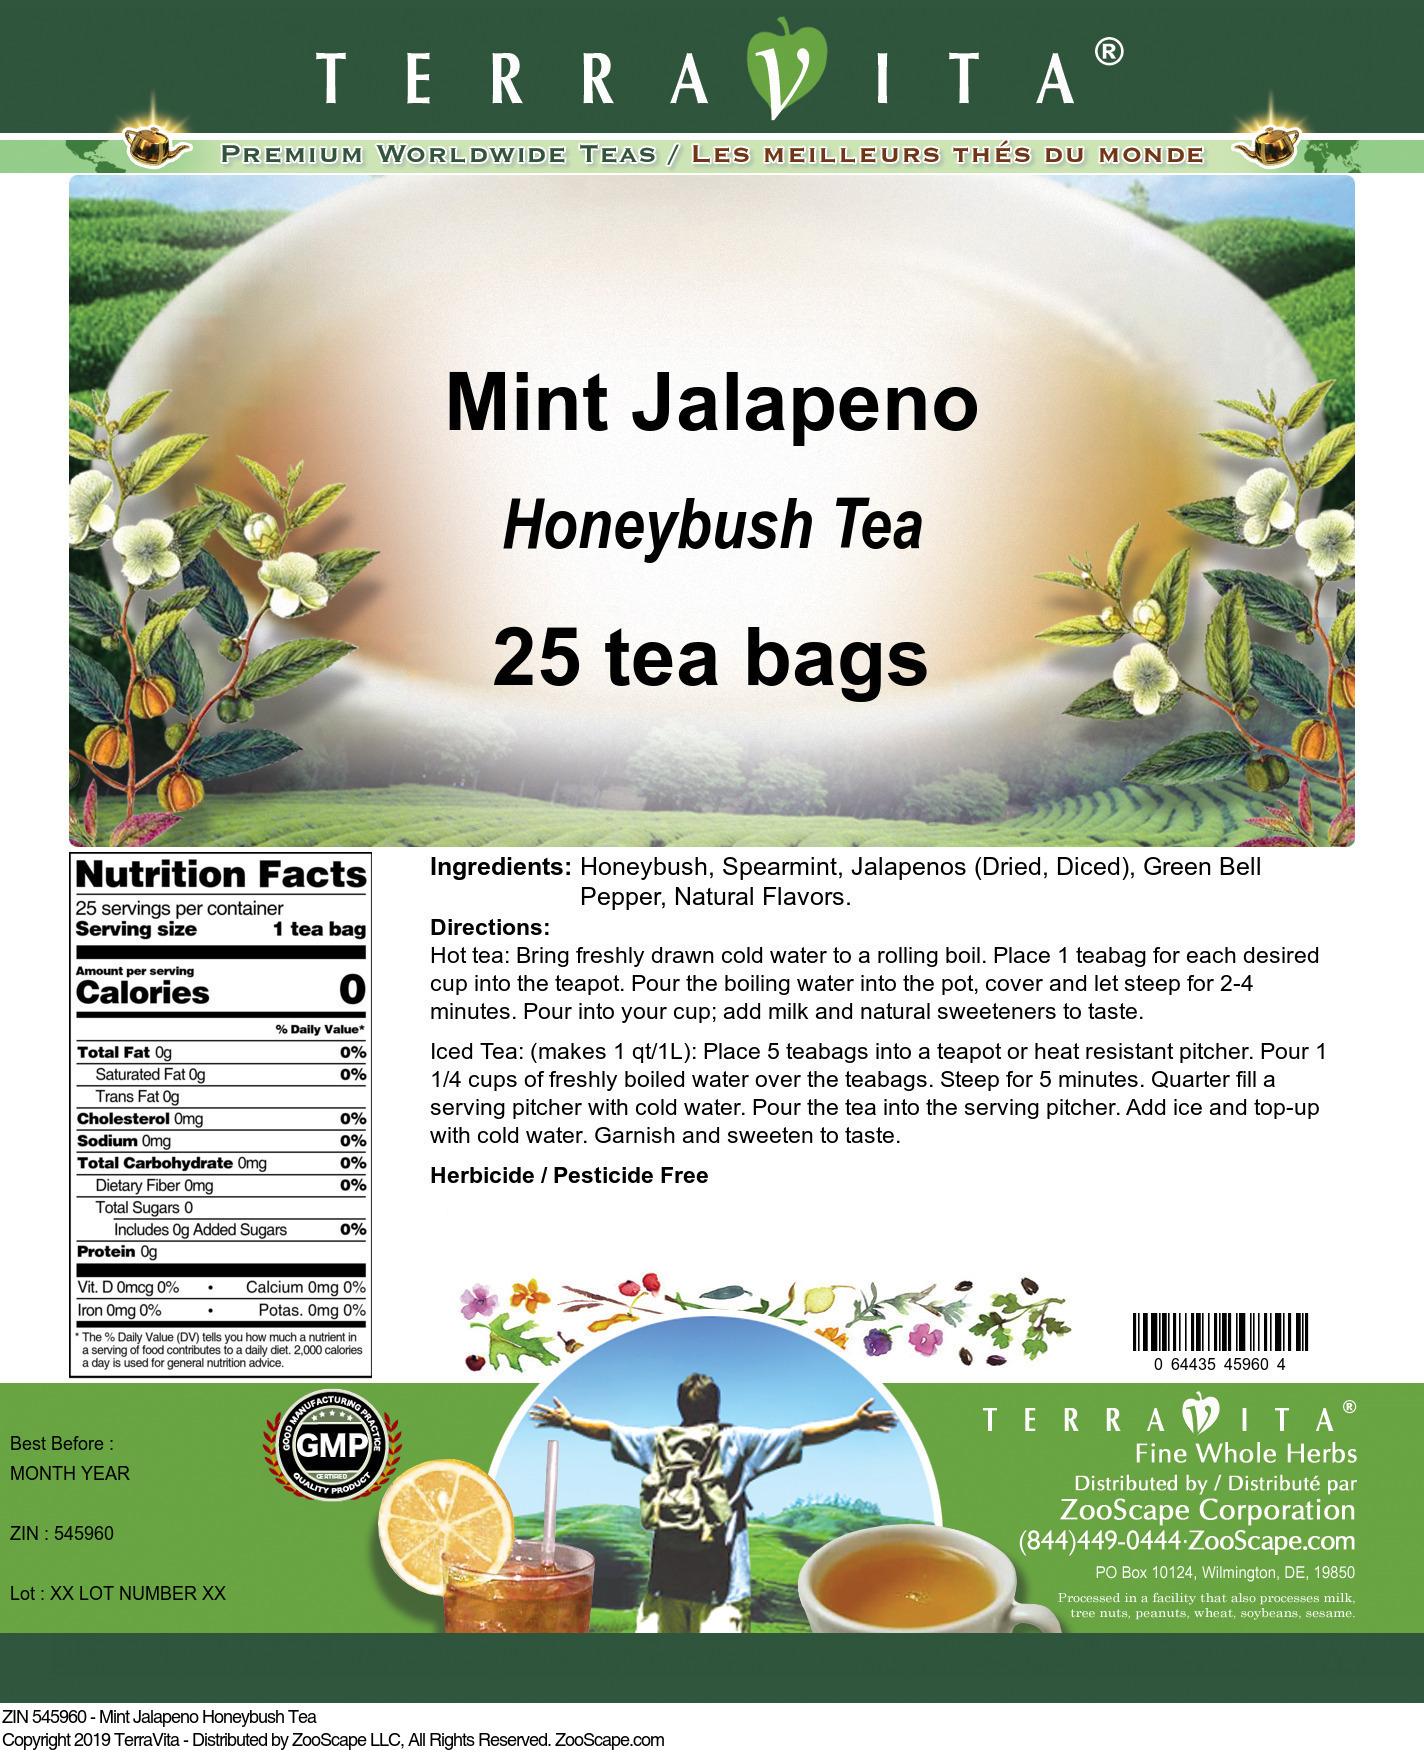 Mint Jalapeno Honeybush Tea